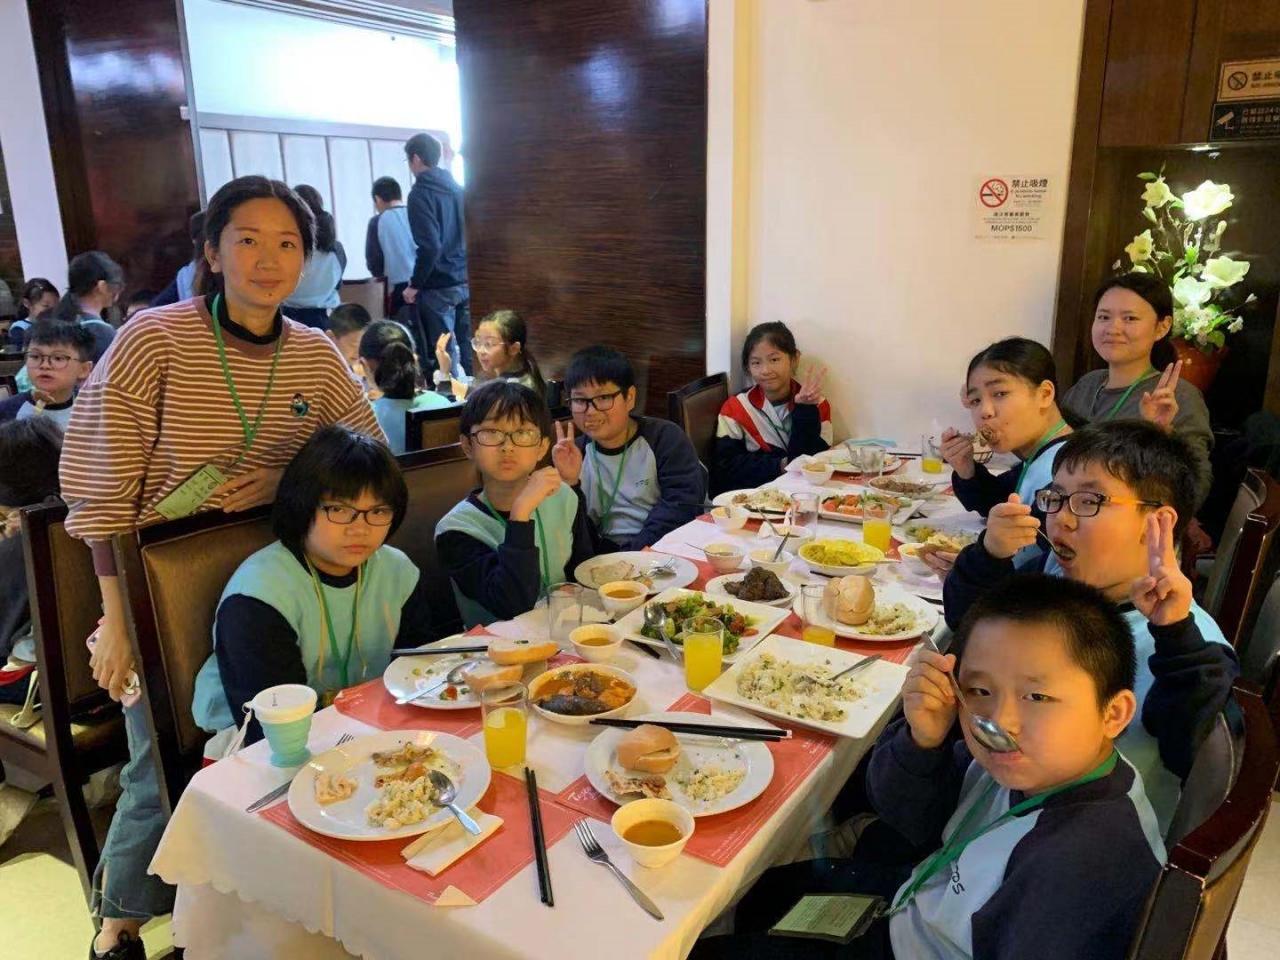 http://keito.school.hk/sites/default/files/batch_trny5149.jpg